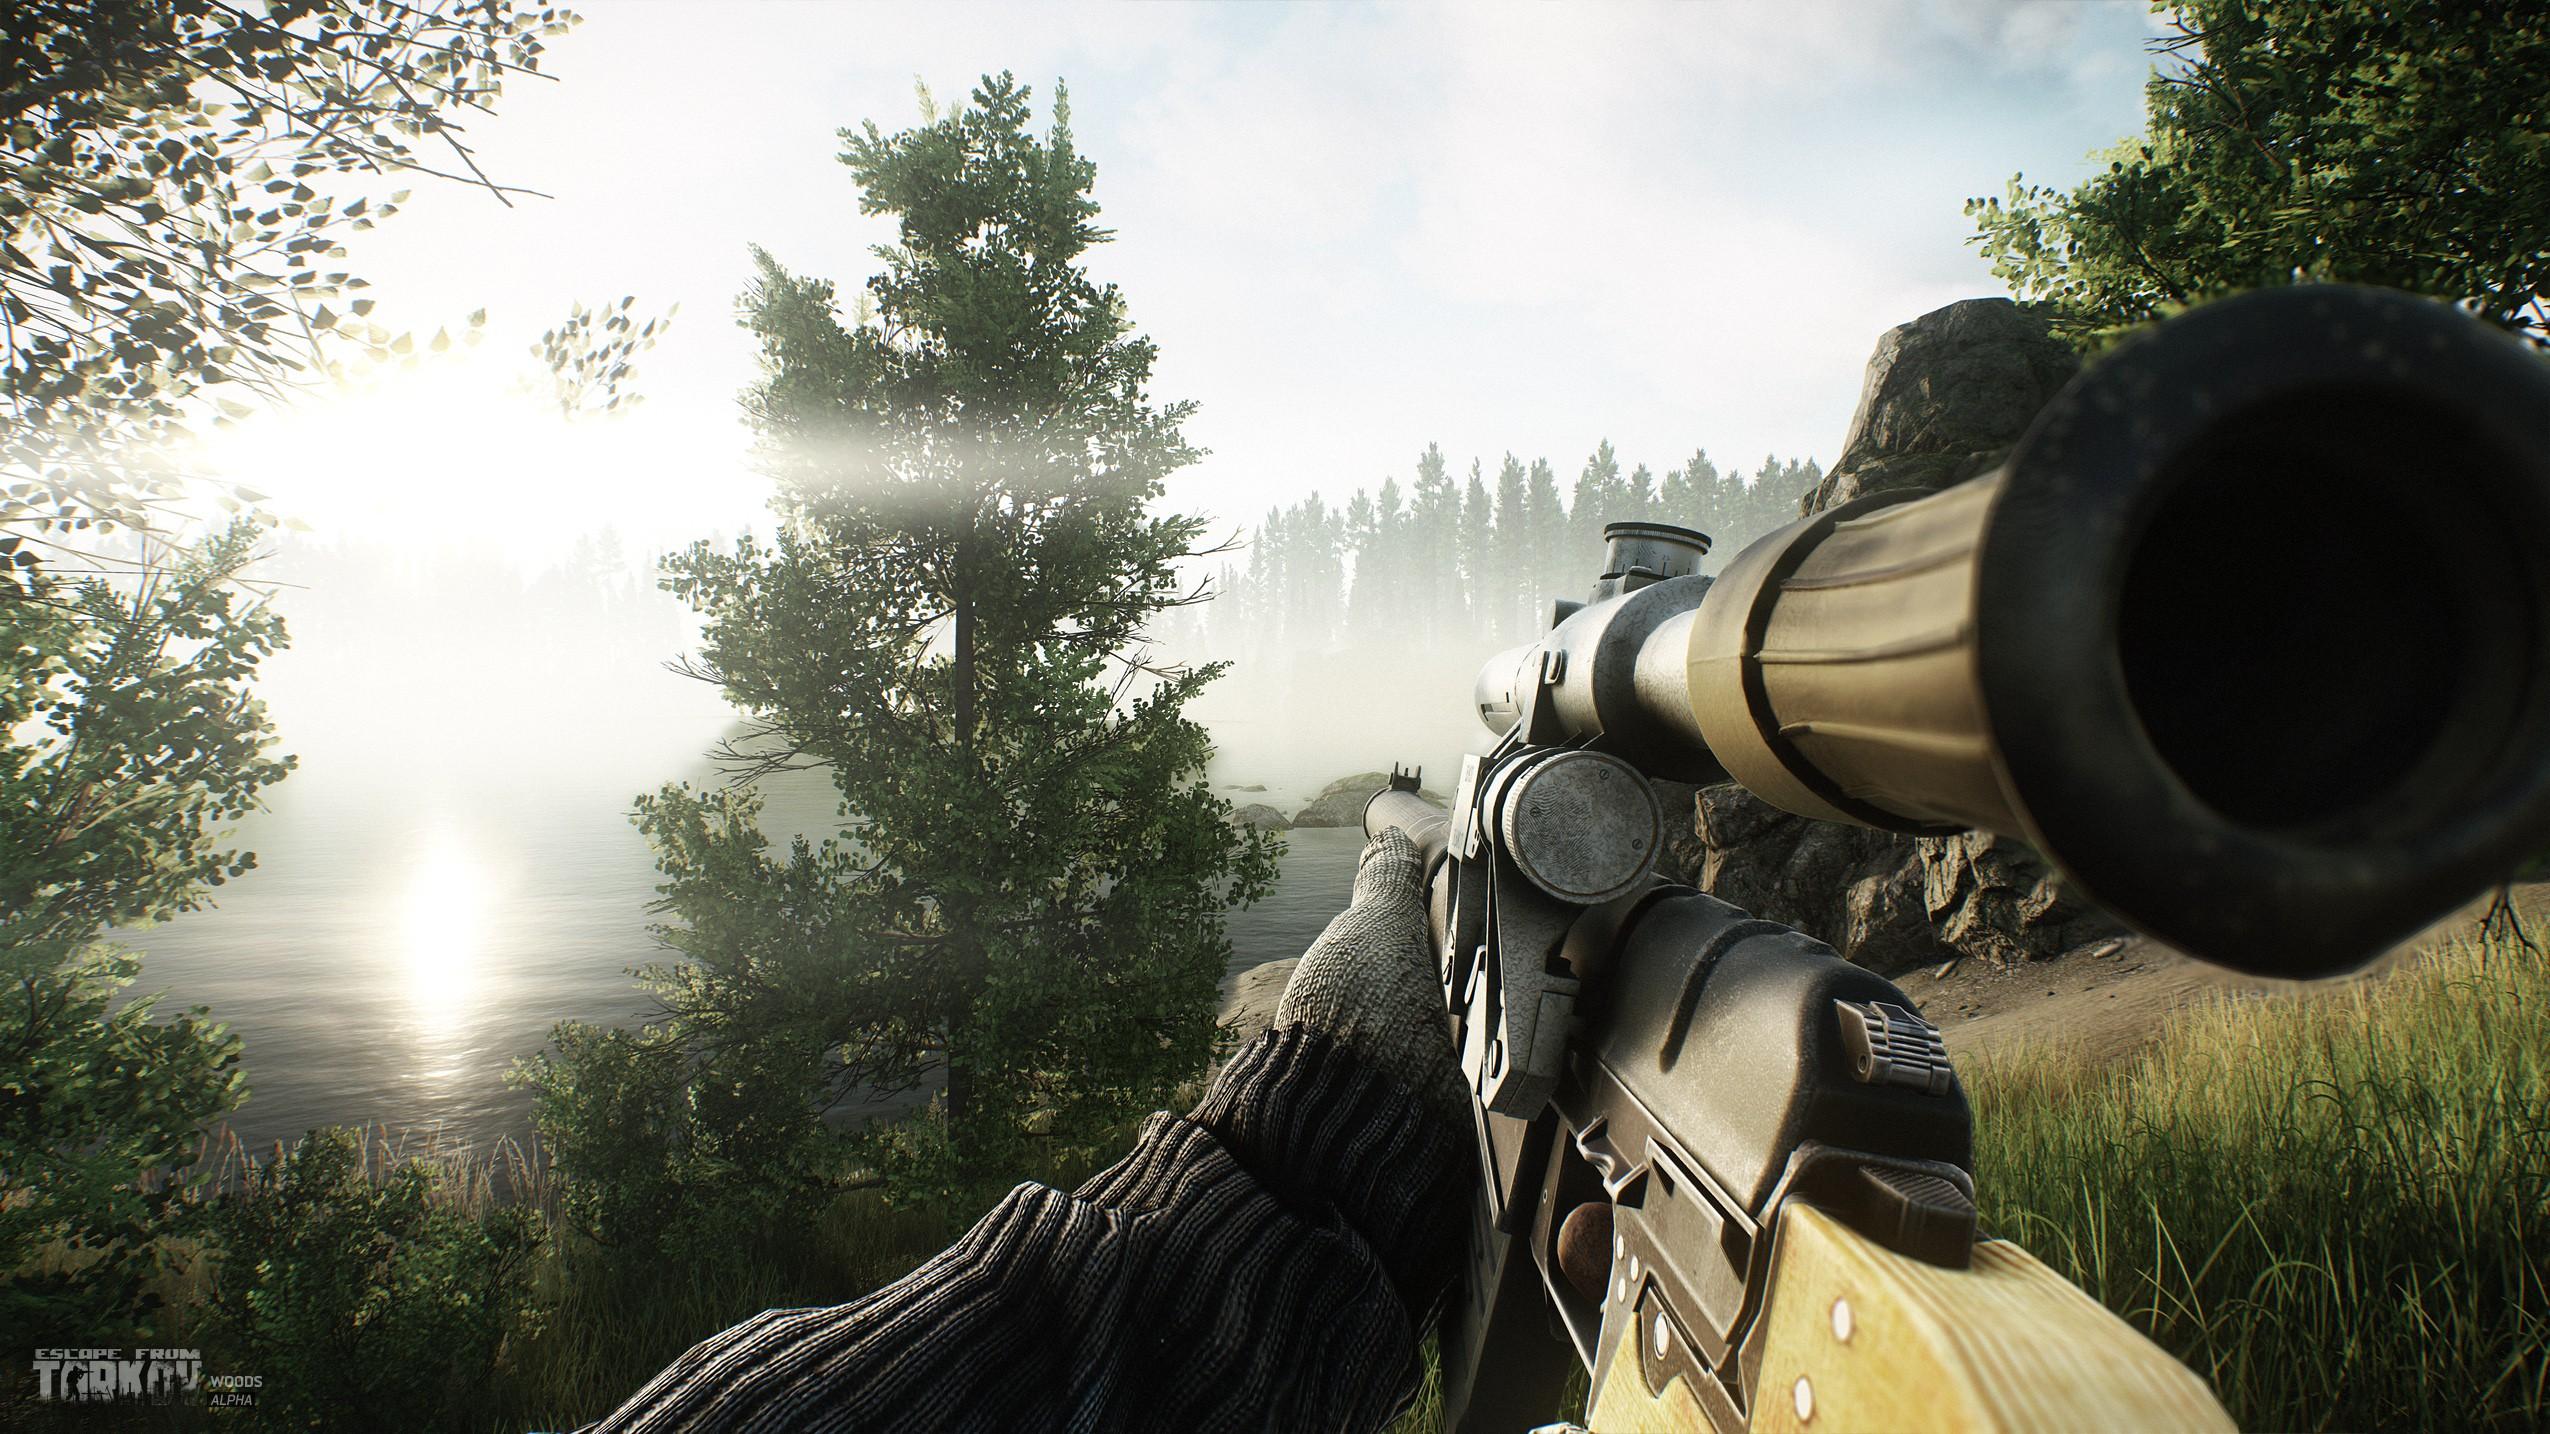 Wallpaper Video Games Soldier Escape From Tarkov